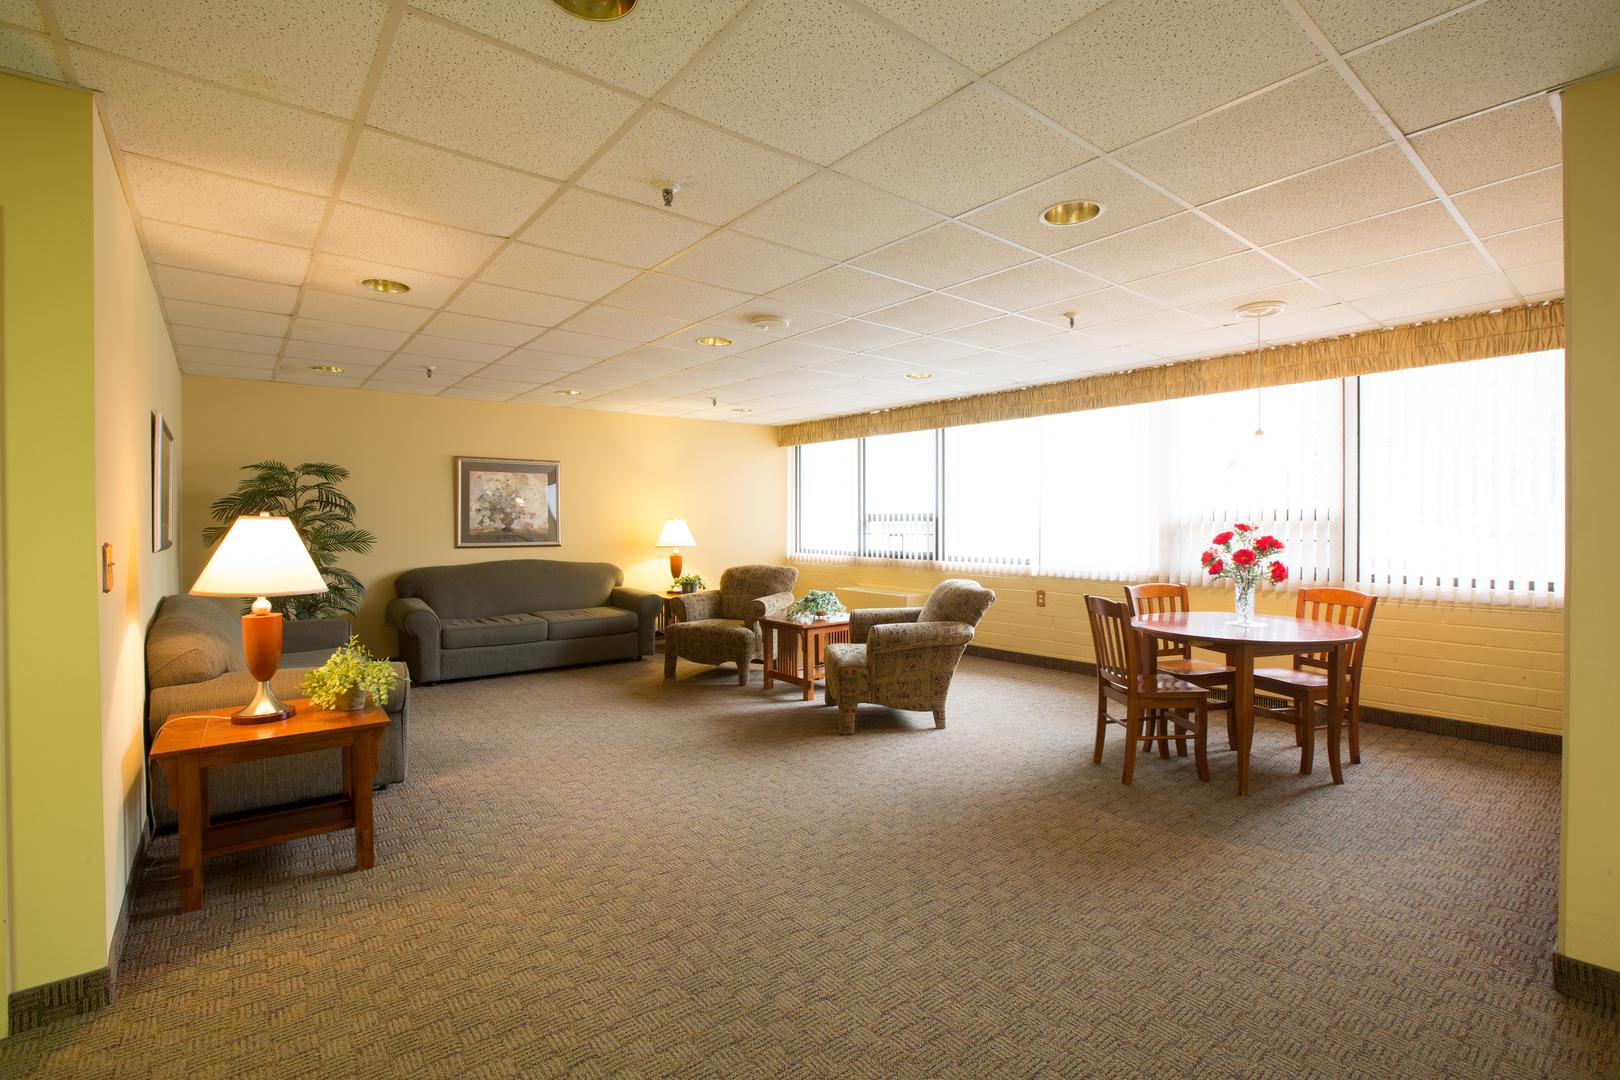 Apartments for Rent in Farmington, MI | Farmington Place - Home